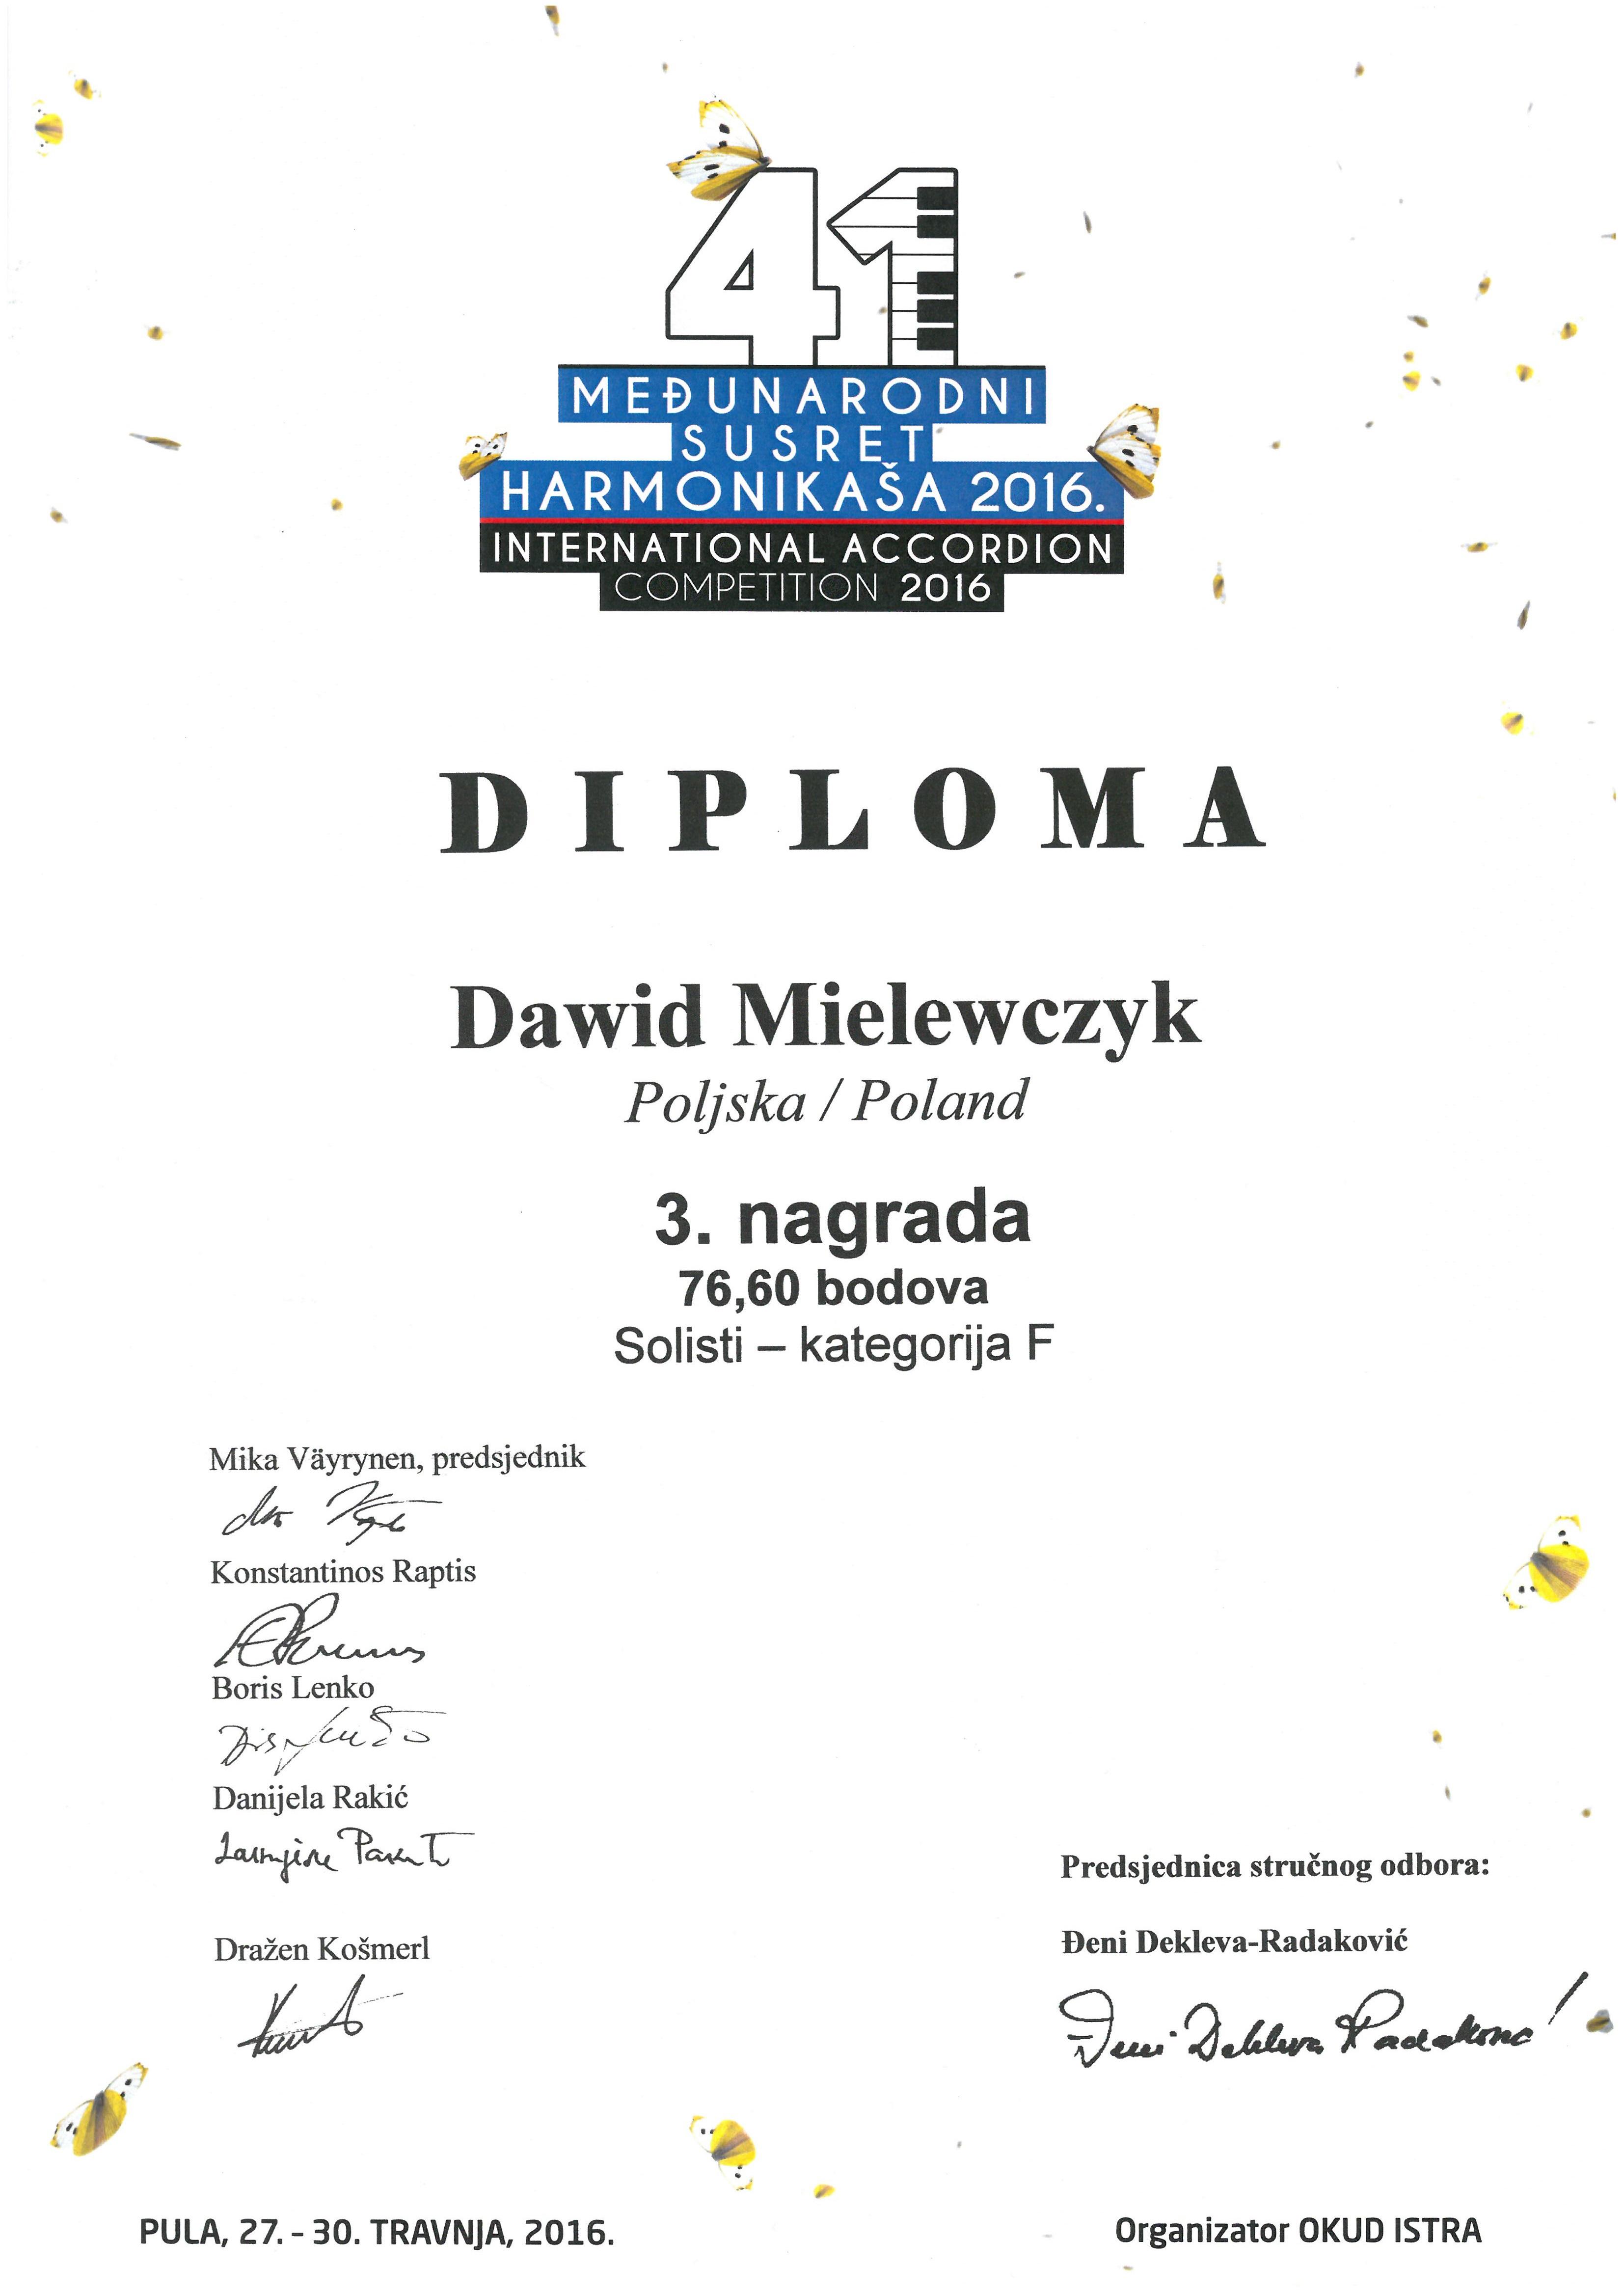 Dawid Mielewczyk_Pula_2016